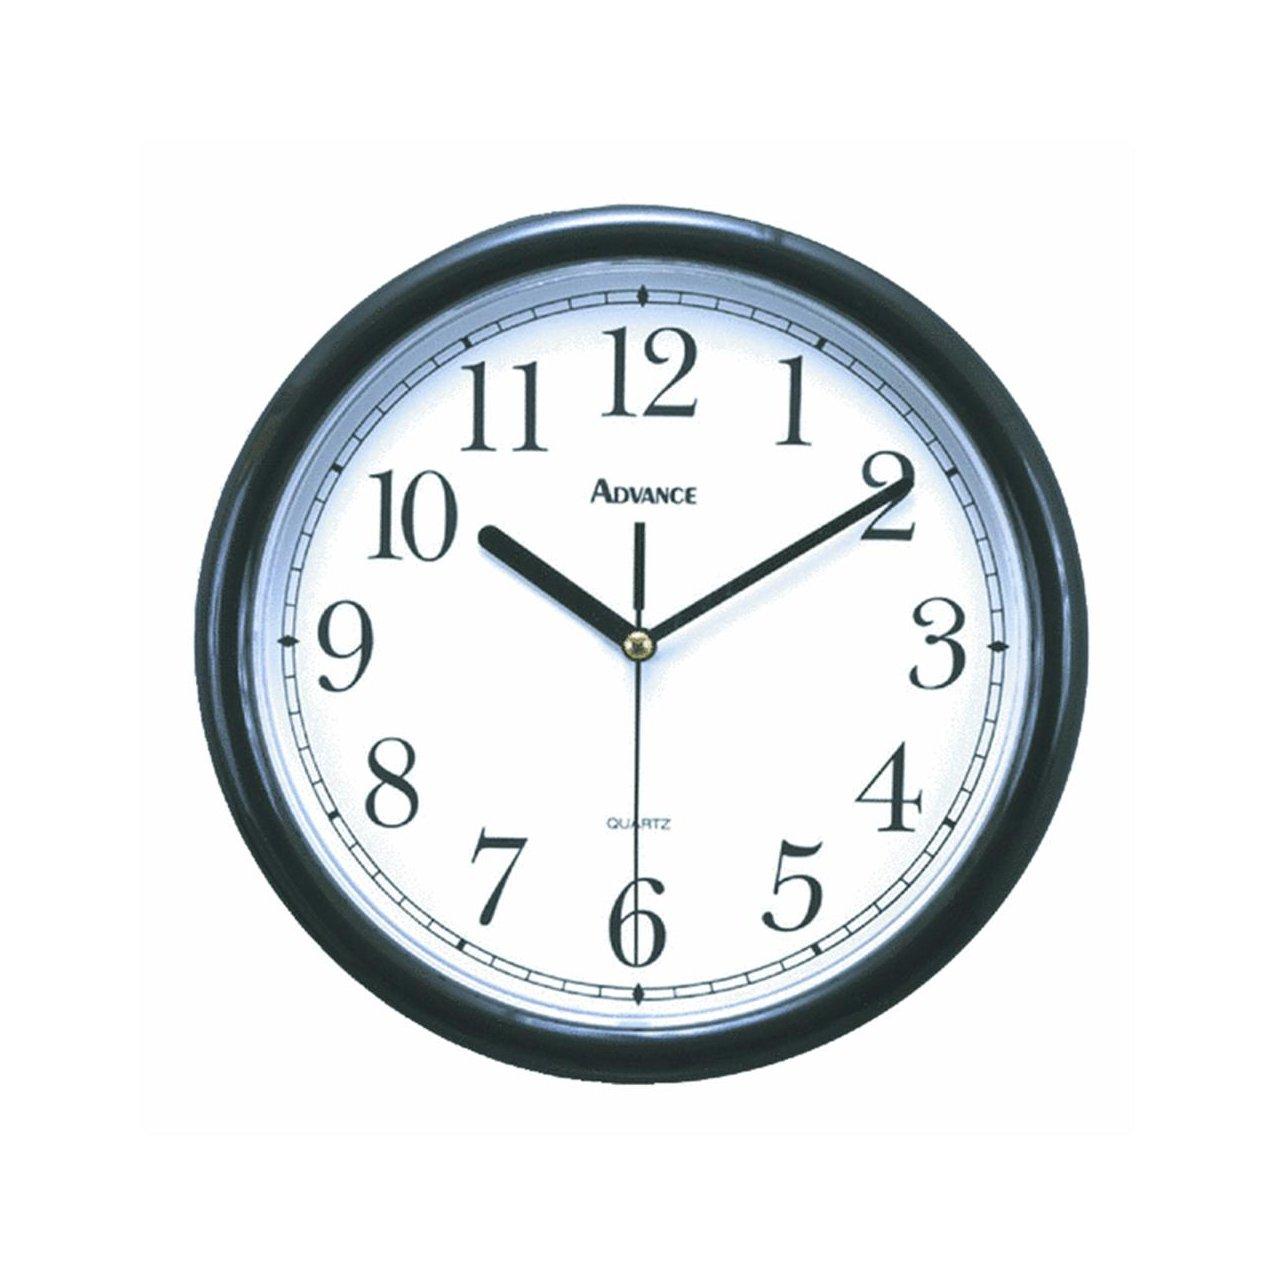 Amazon advance clock co 10 wall clock black home kitchen 10 wall clock black home kitchen amipublicfo Images